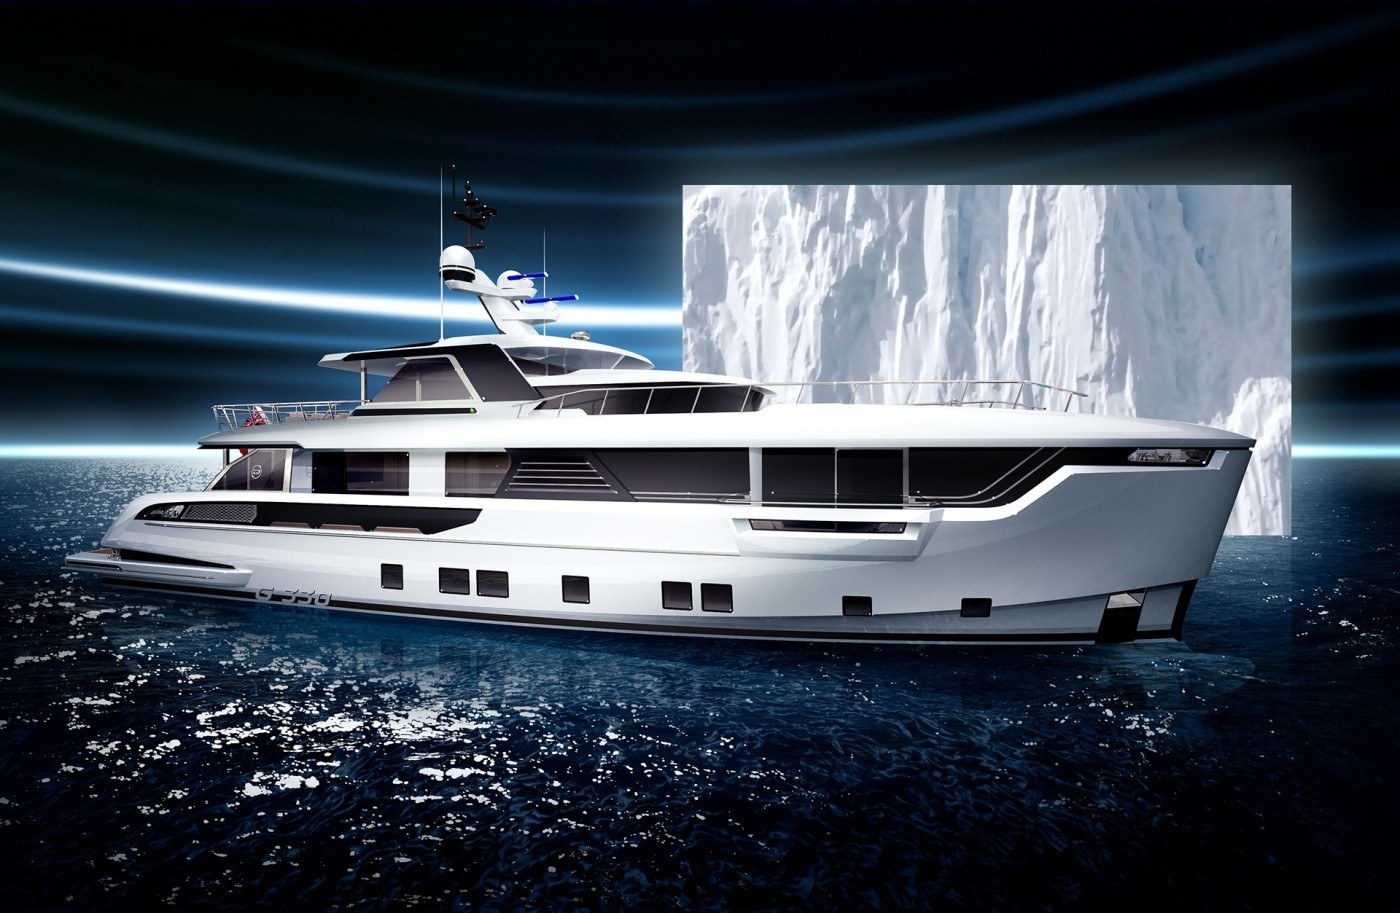 imagen 2 de Global 330, el primer yate para exploradores de Dynamiq Yachts.